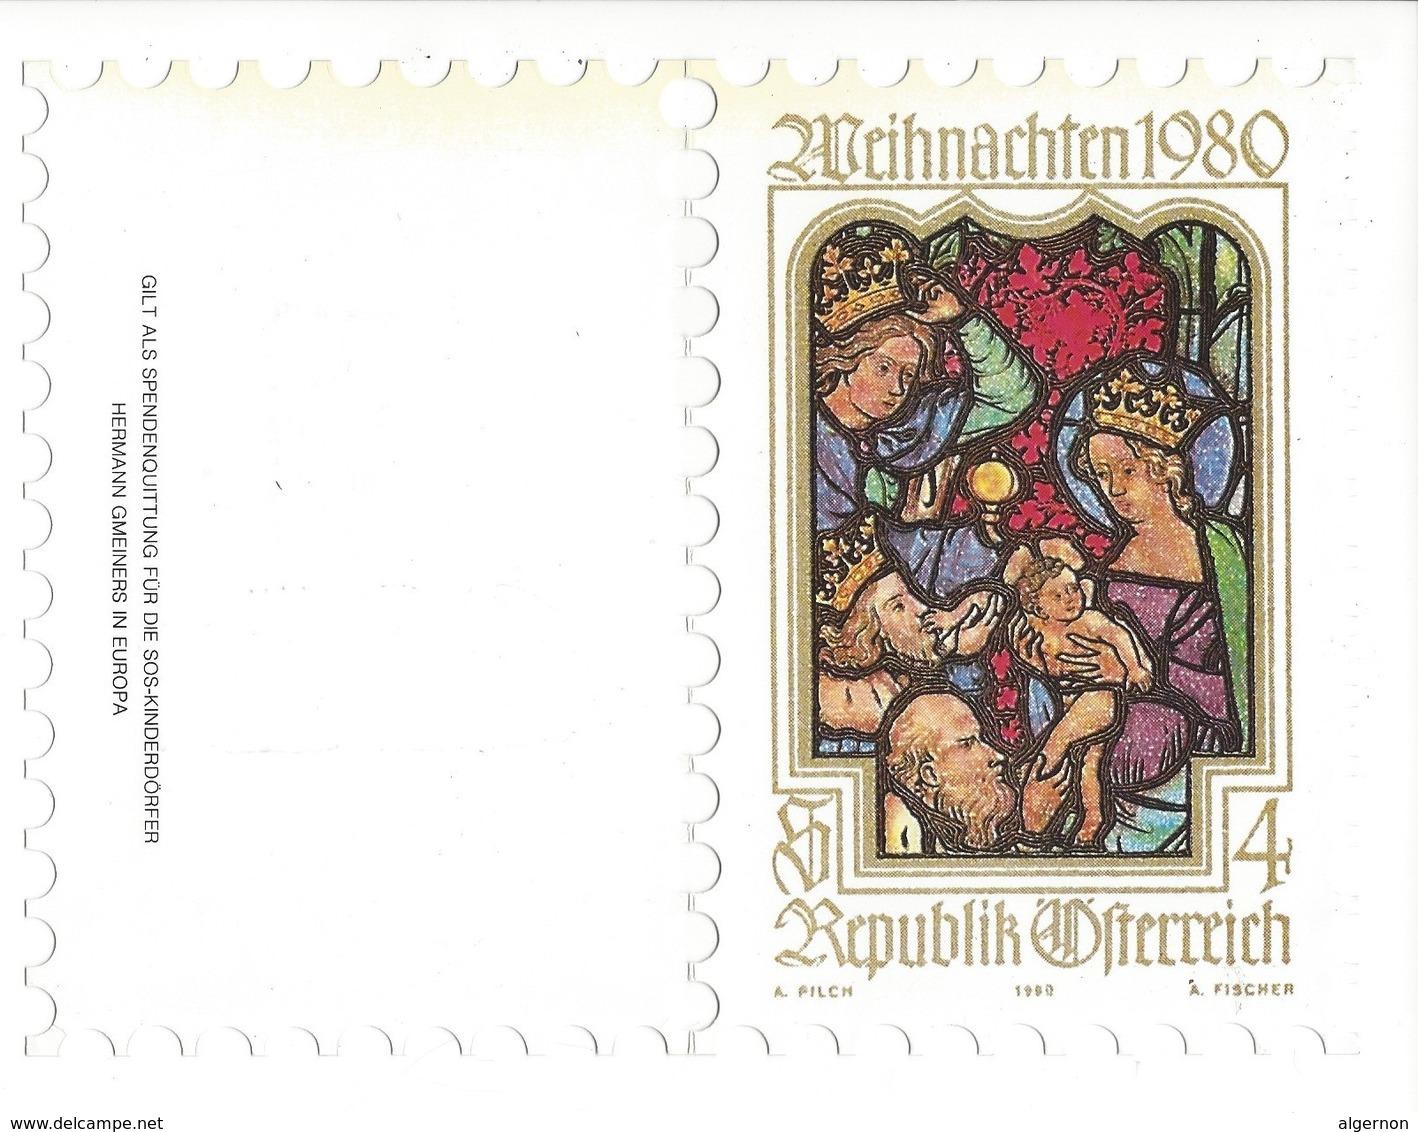 20979 -  Christkindl 24.12.1980 Republik Österreich A Pilch 1980 A Fischer - Noël